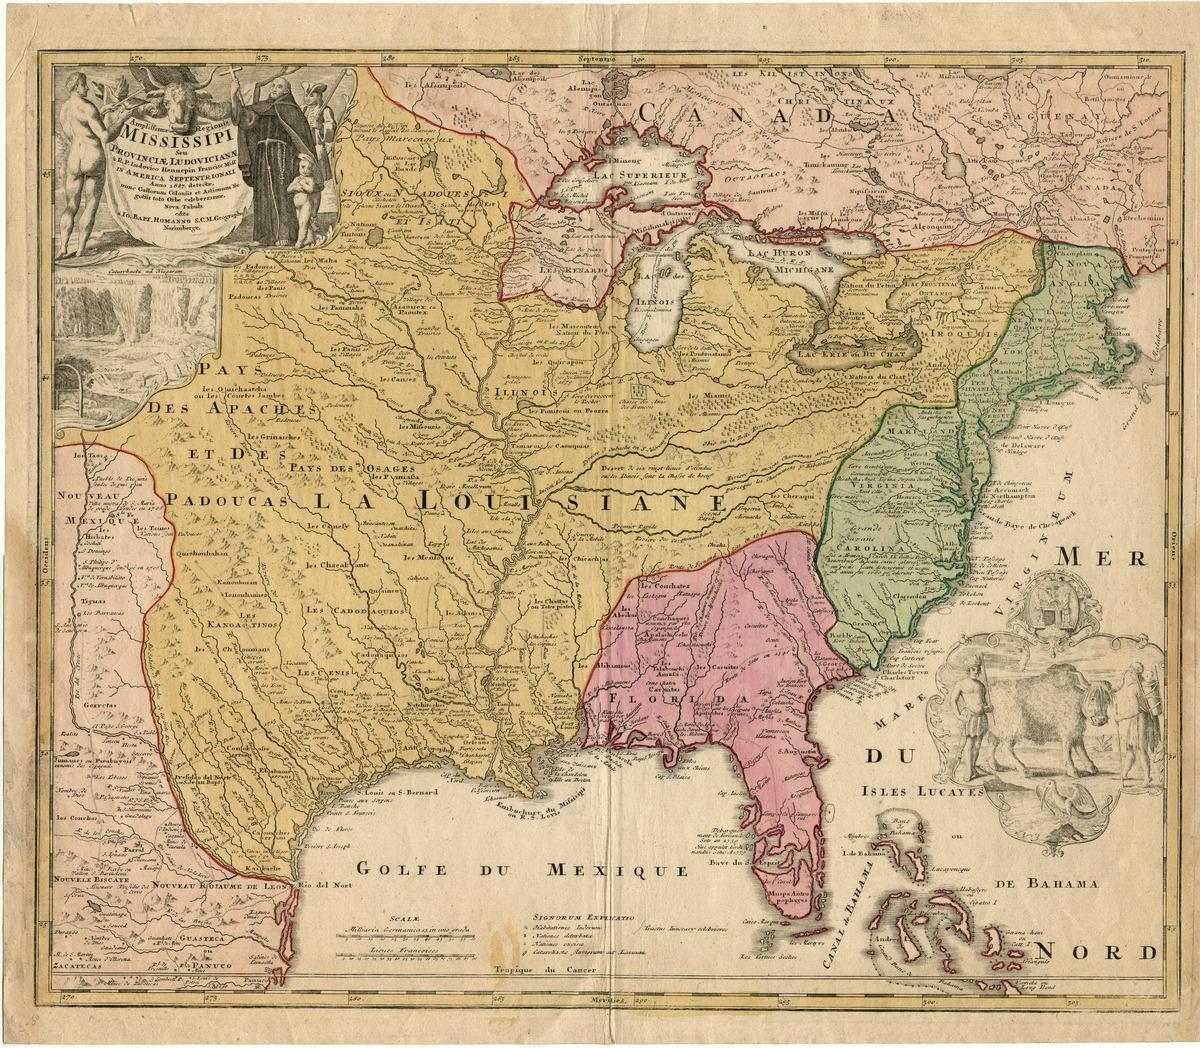 Amplissimae regionis Mississippi, seu Provinciae Ludoviciane à R.P. Ludovico Hennepin Francisc miss in America Septentrionali anno 1687. . .